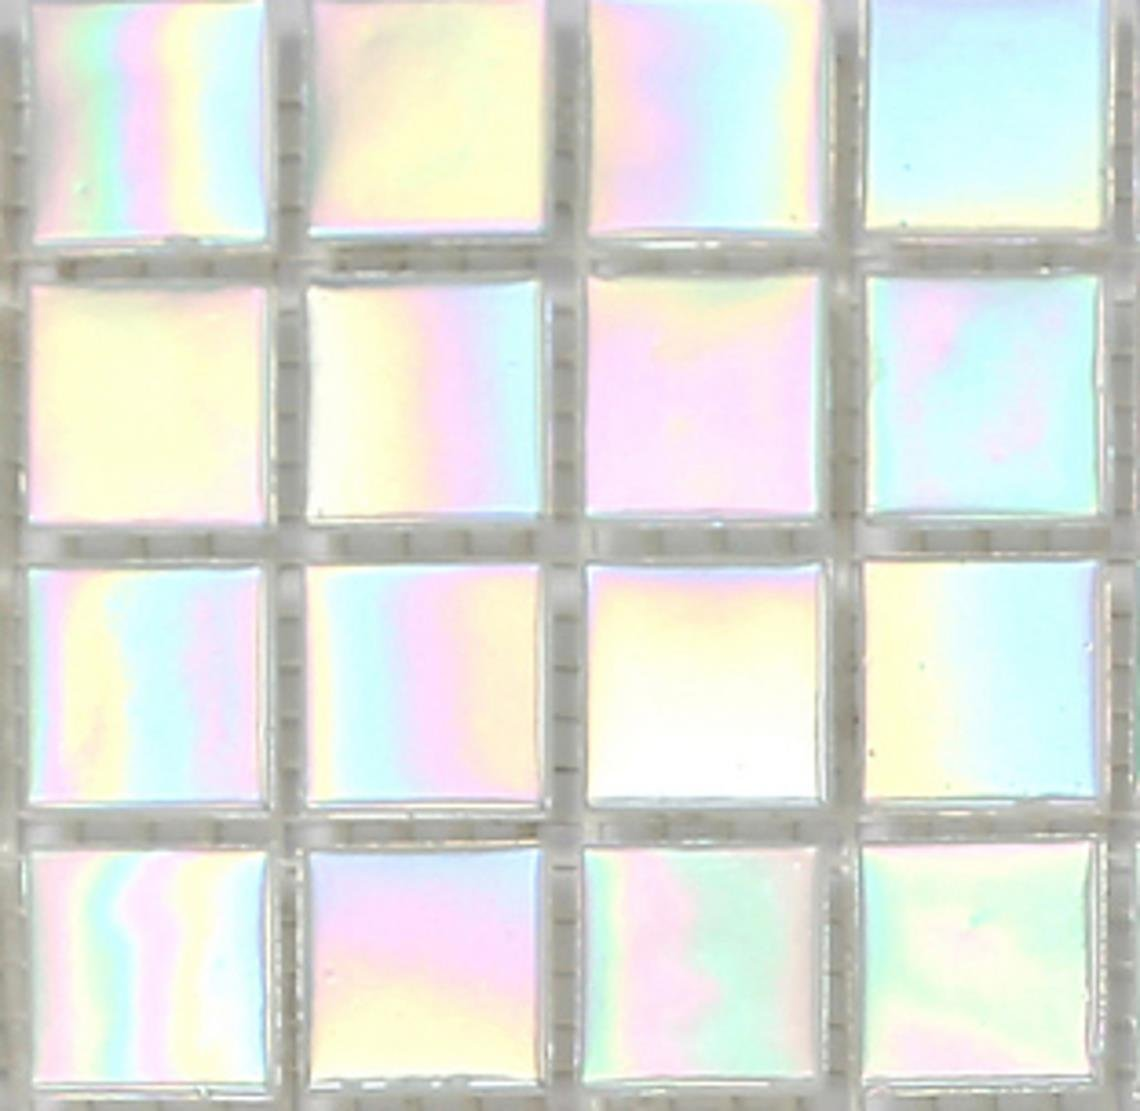 10x10cm Sample Shades Of Iridescent White Vitreous Glass Mosaic Tiles Sheet (MT0131) Grand Taps